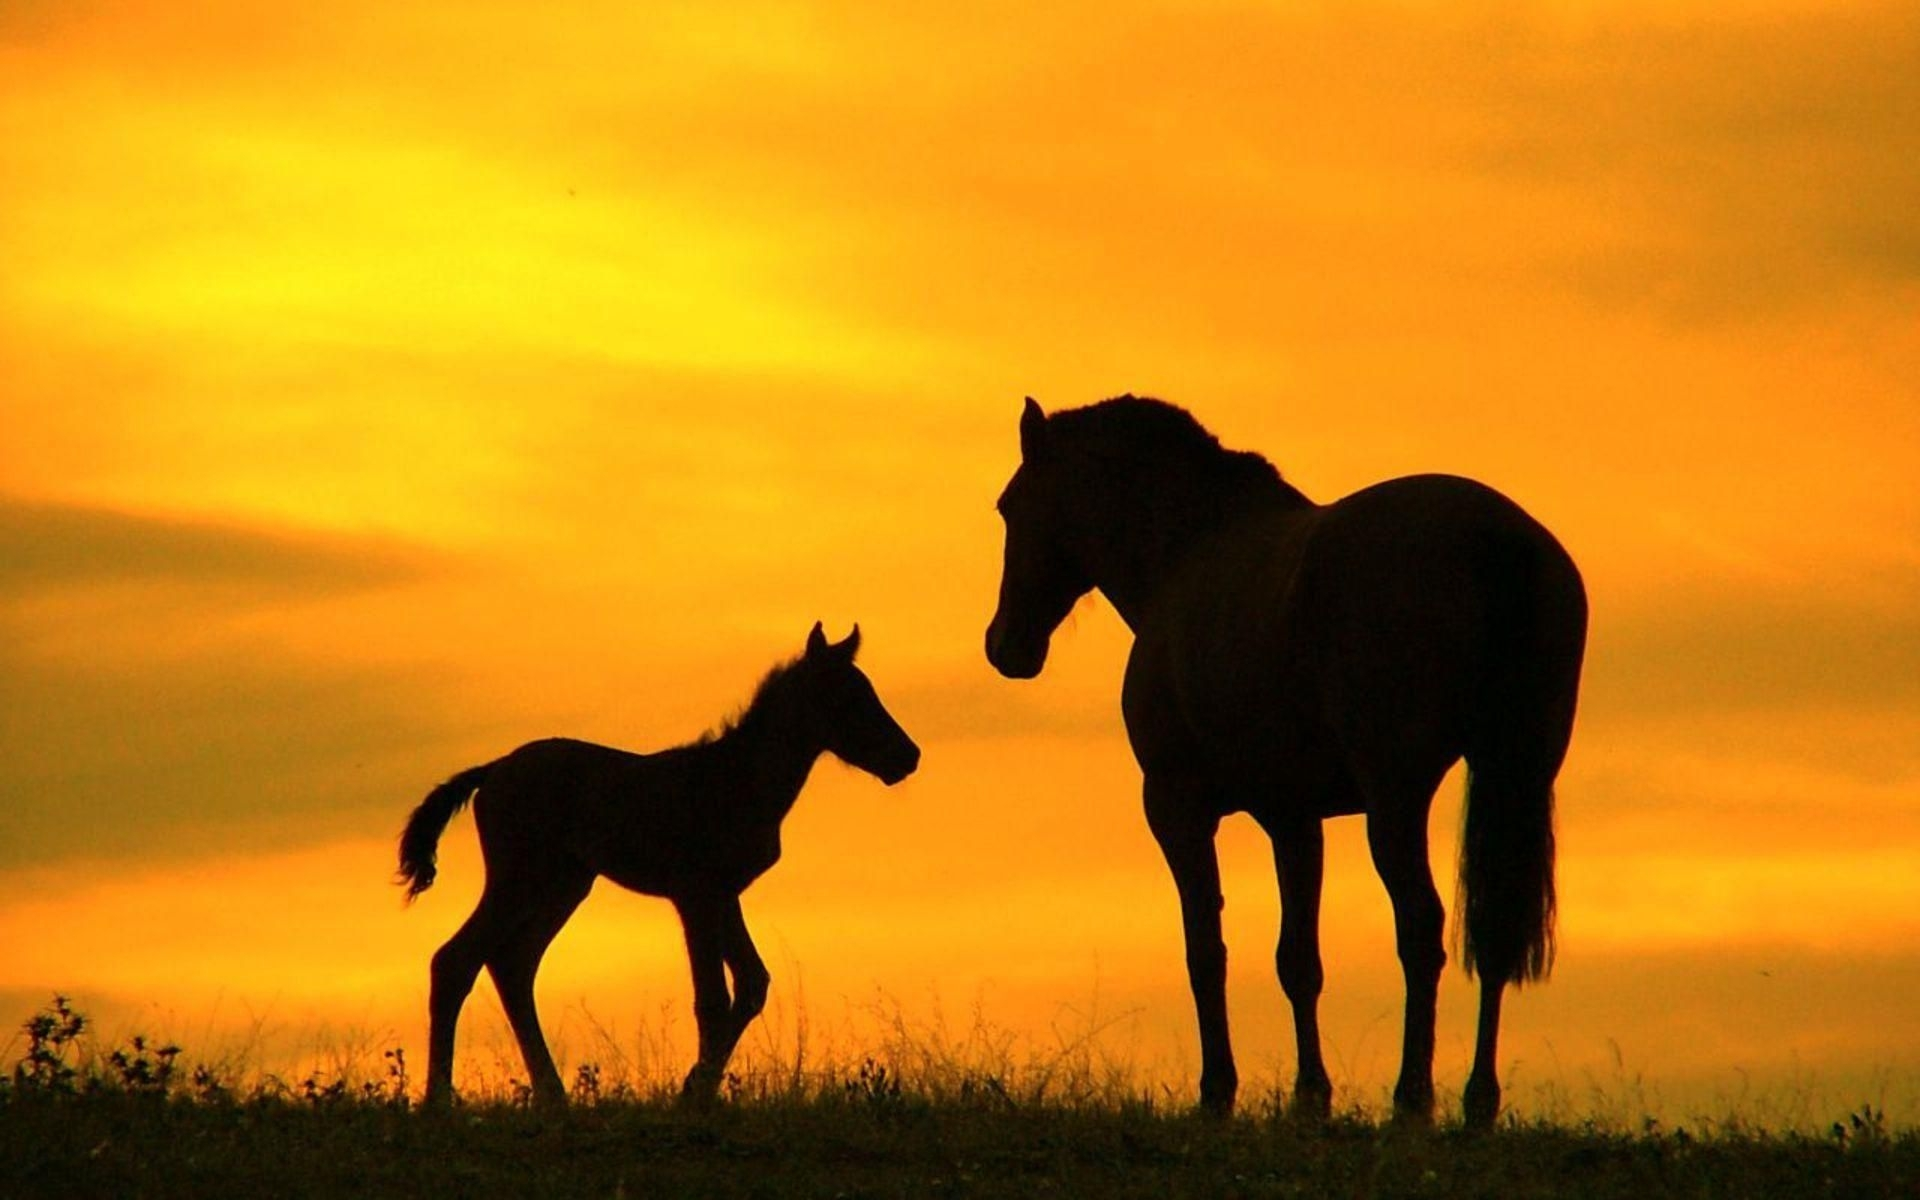 animals zoo park: horses wallpapers for desktop | horse wallpaper